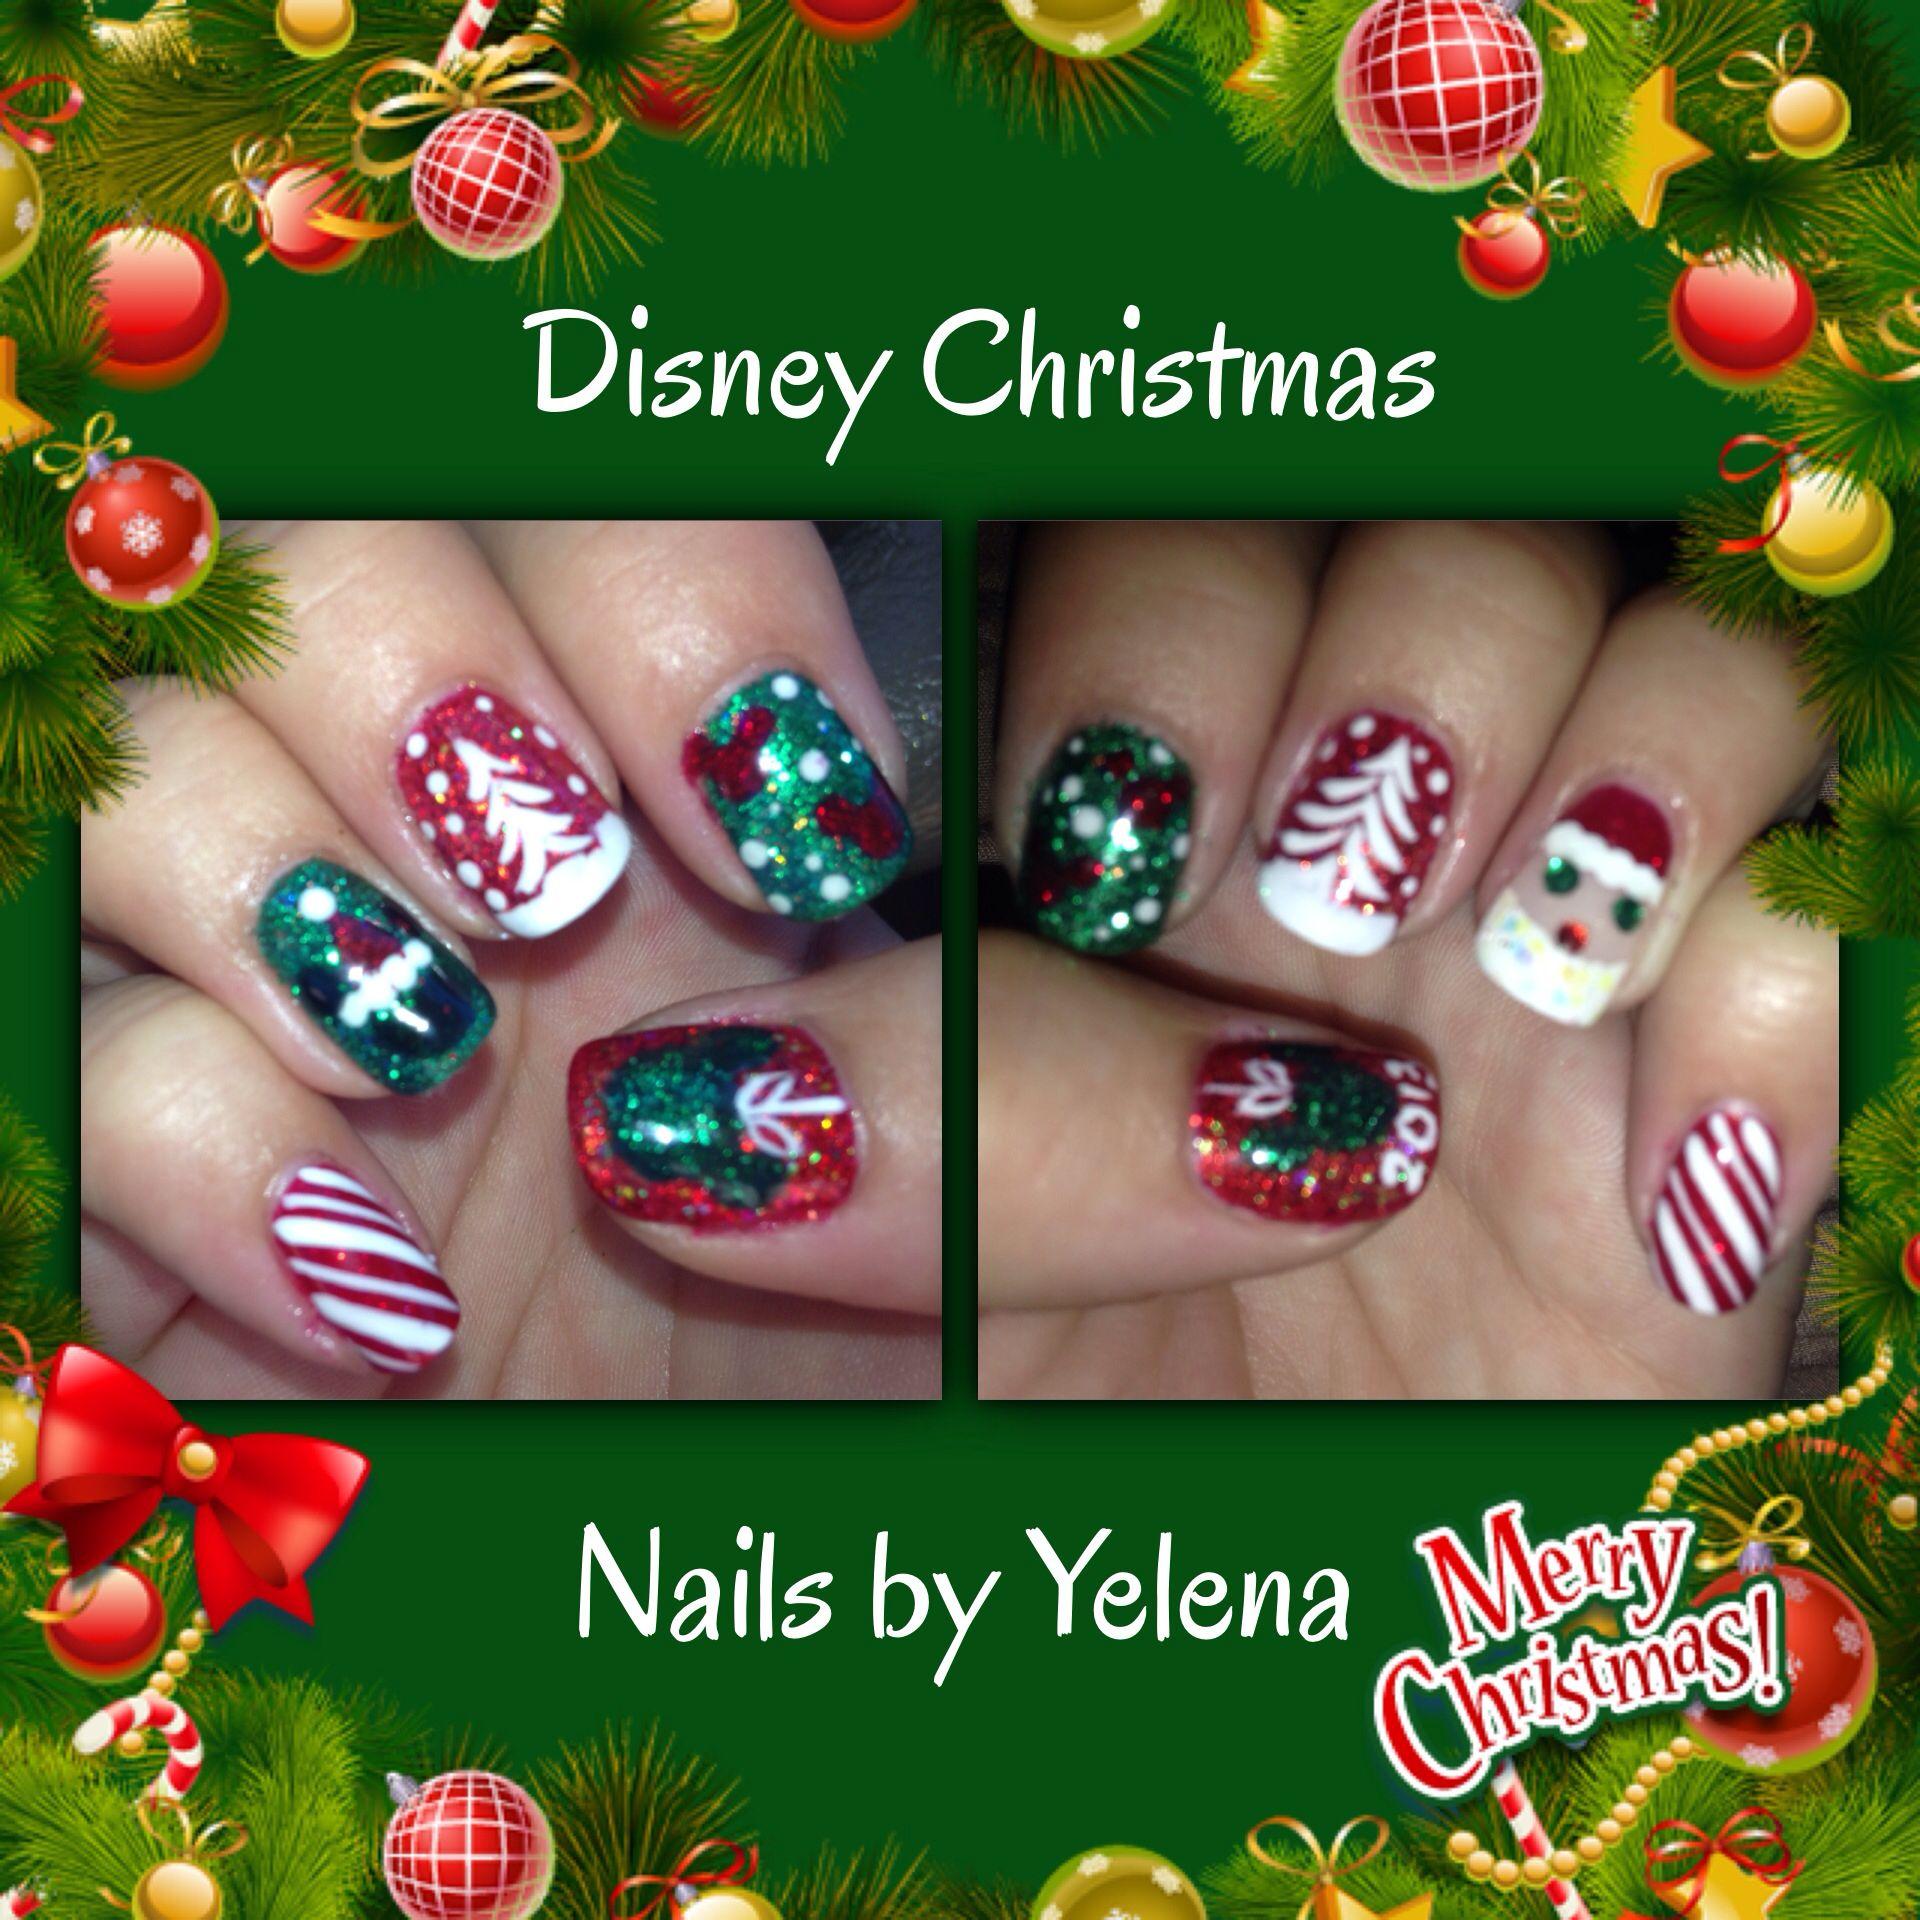 Disney Christmas nails by Yelena | Disney nails | Pinterest ...